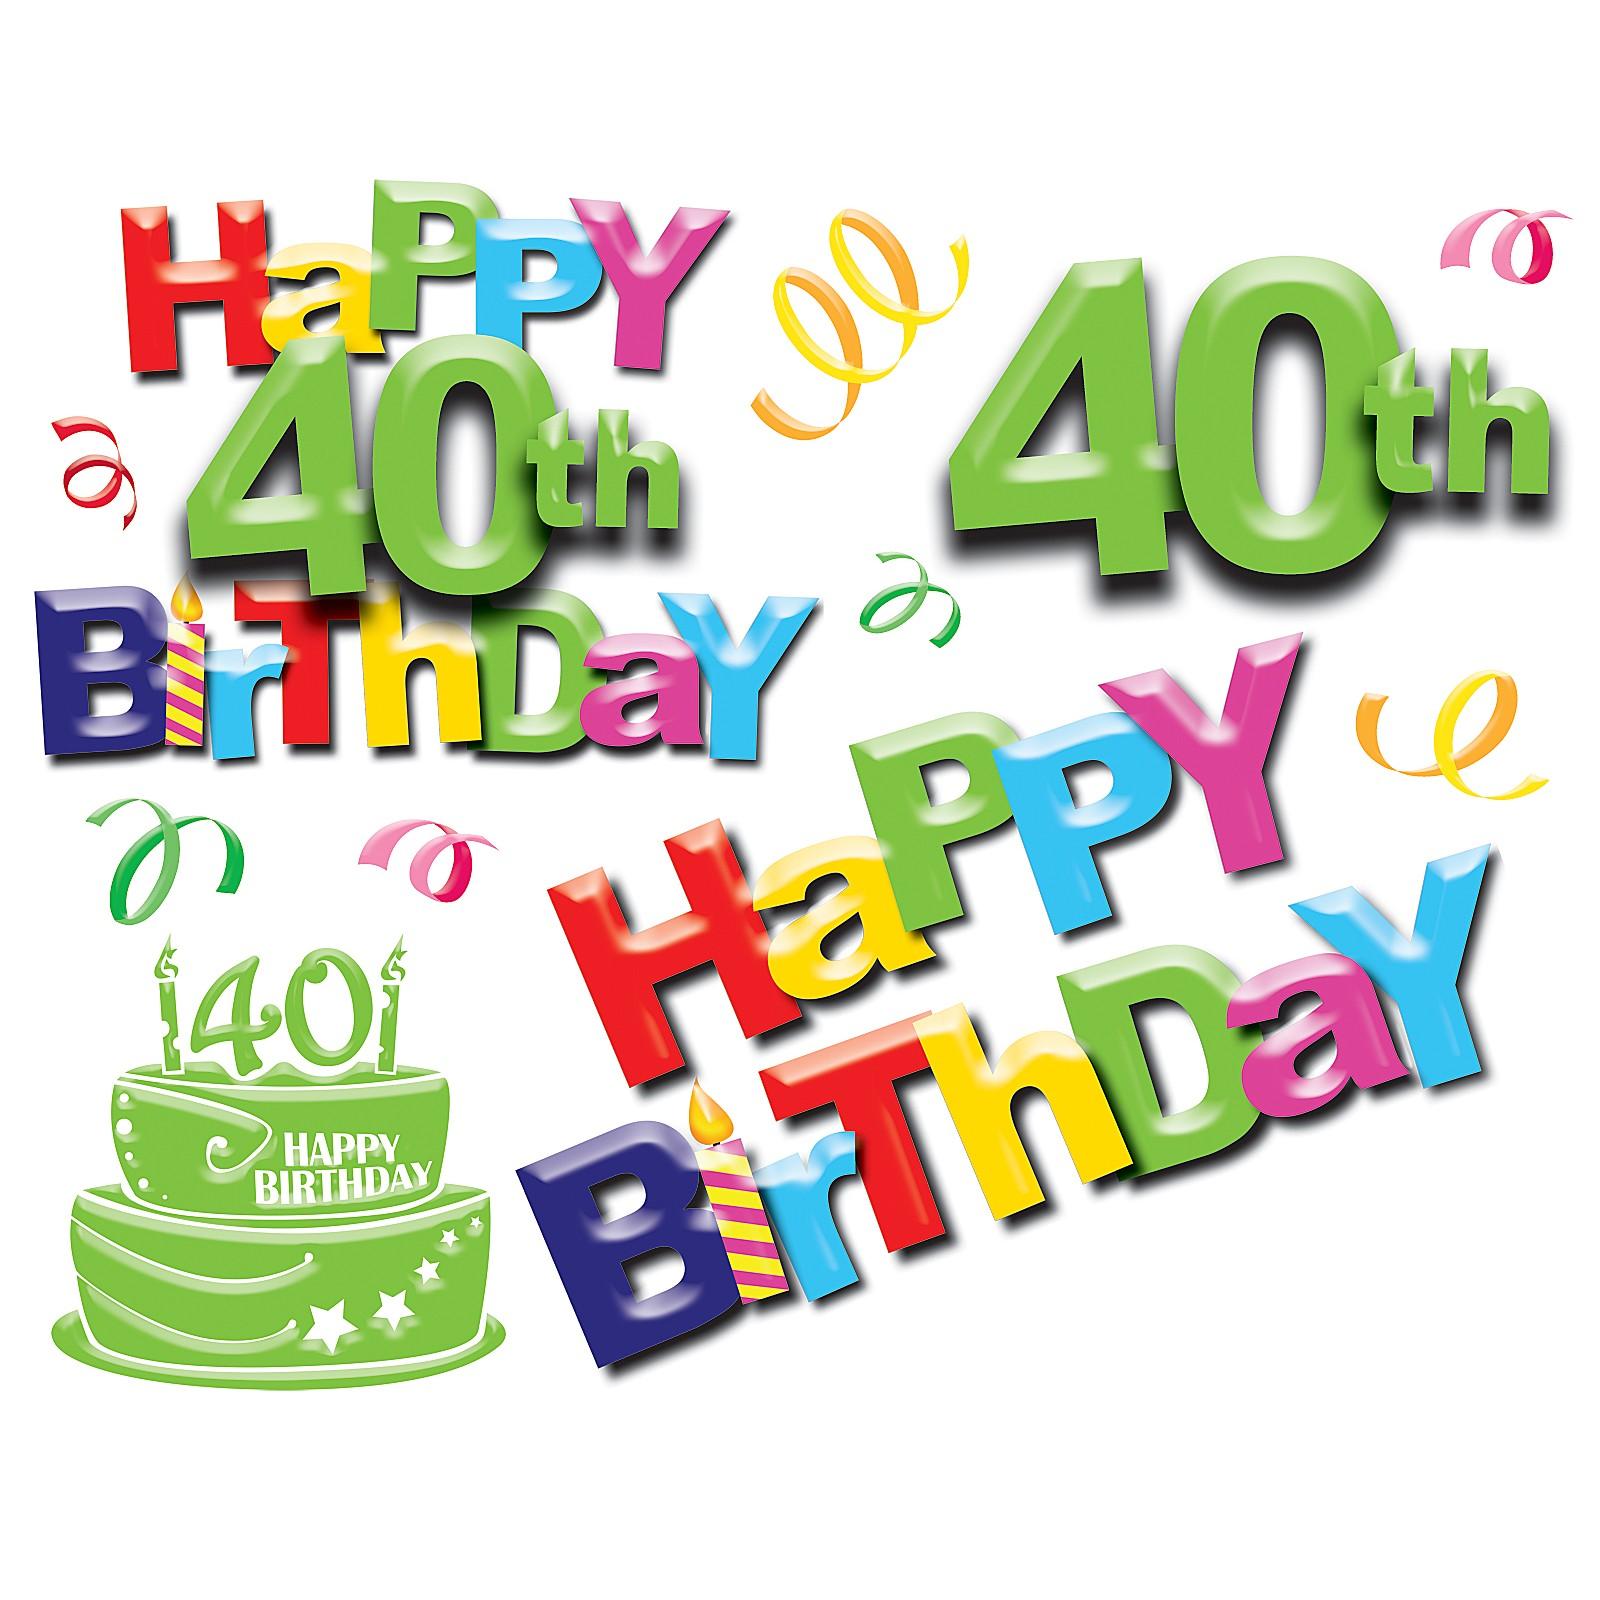 40th birthday clipart borders clipart royalty free Free Happy 40th Birthday Clipart, Download Free Clip Art, Free Clip ... clipart royalty free